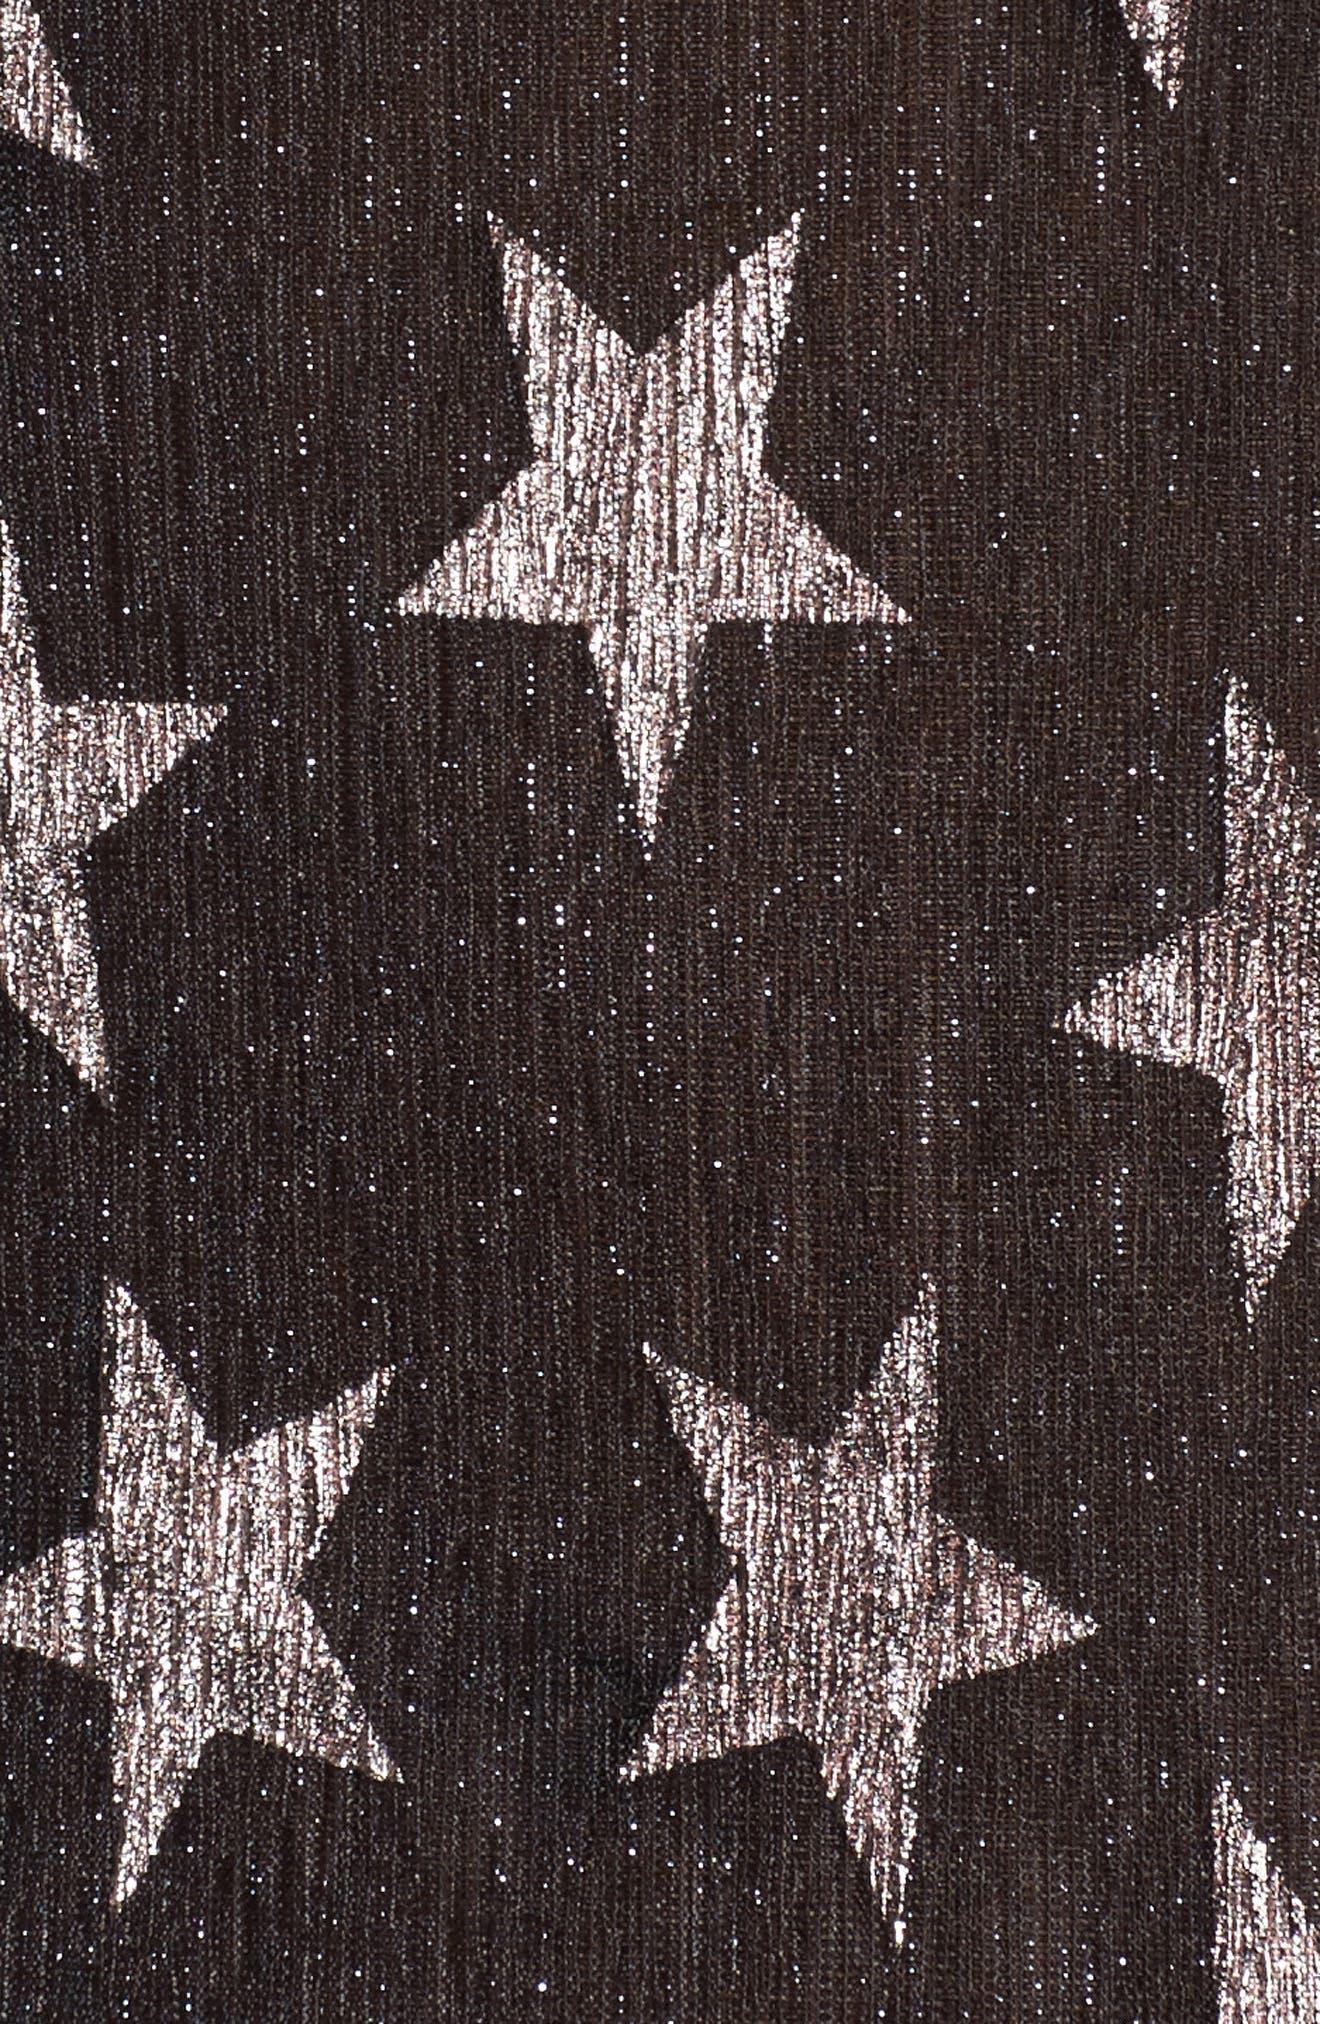 Metallic Star Tee,                             Alternate thumbnail 5, color,                             Black Metallic